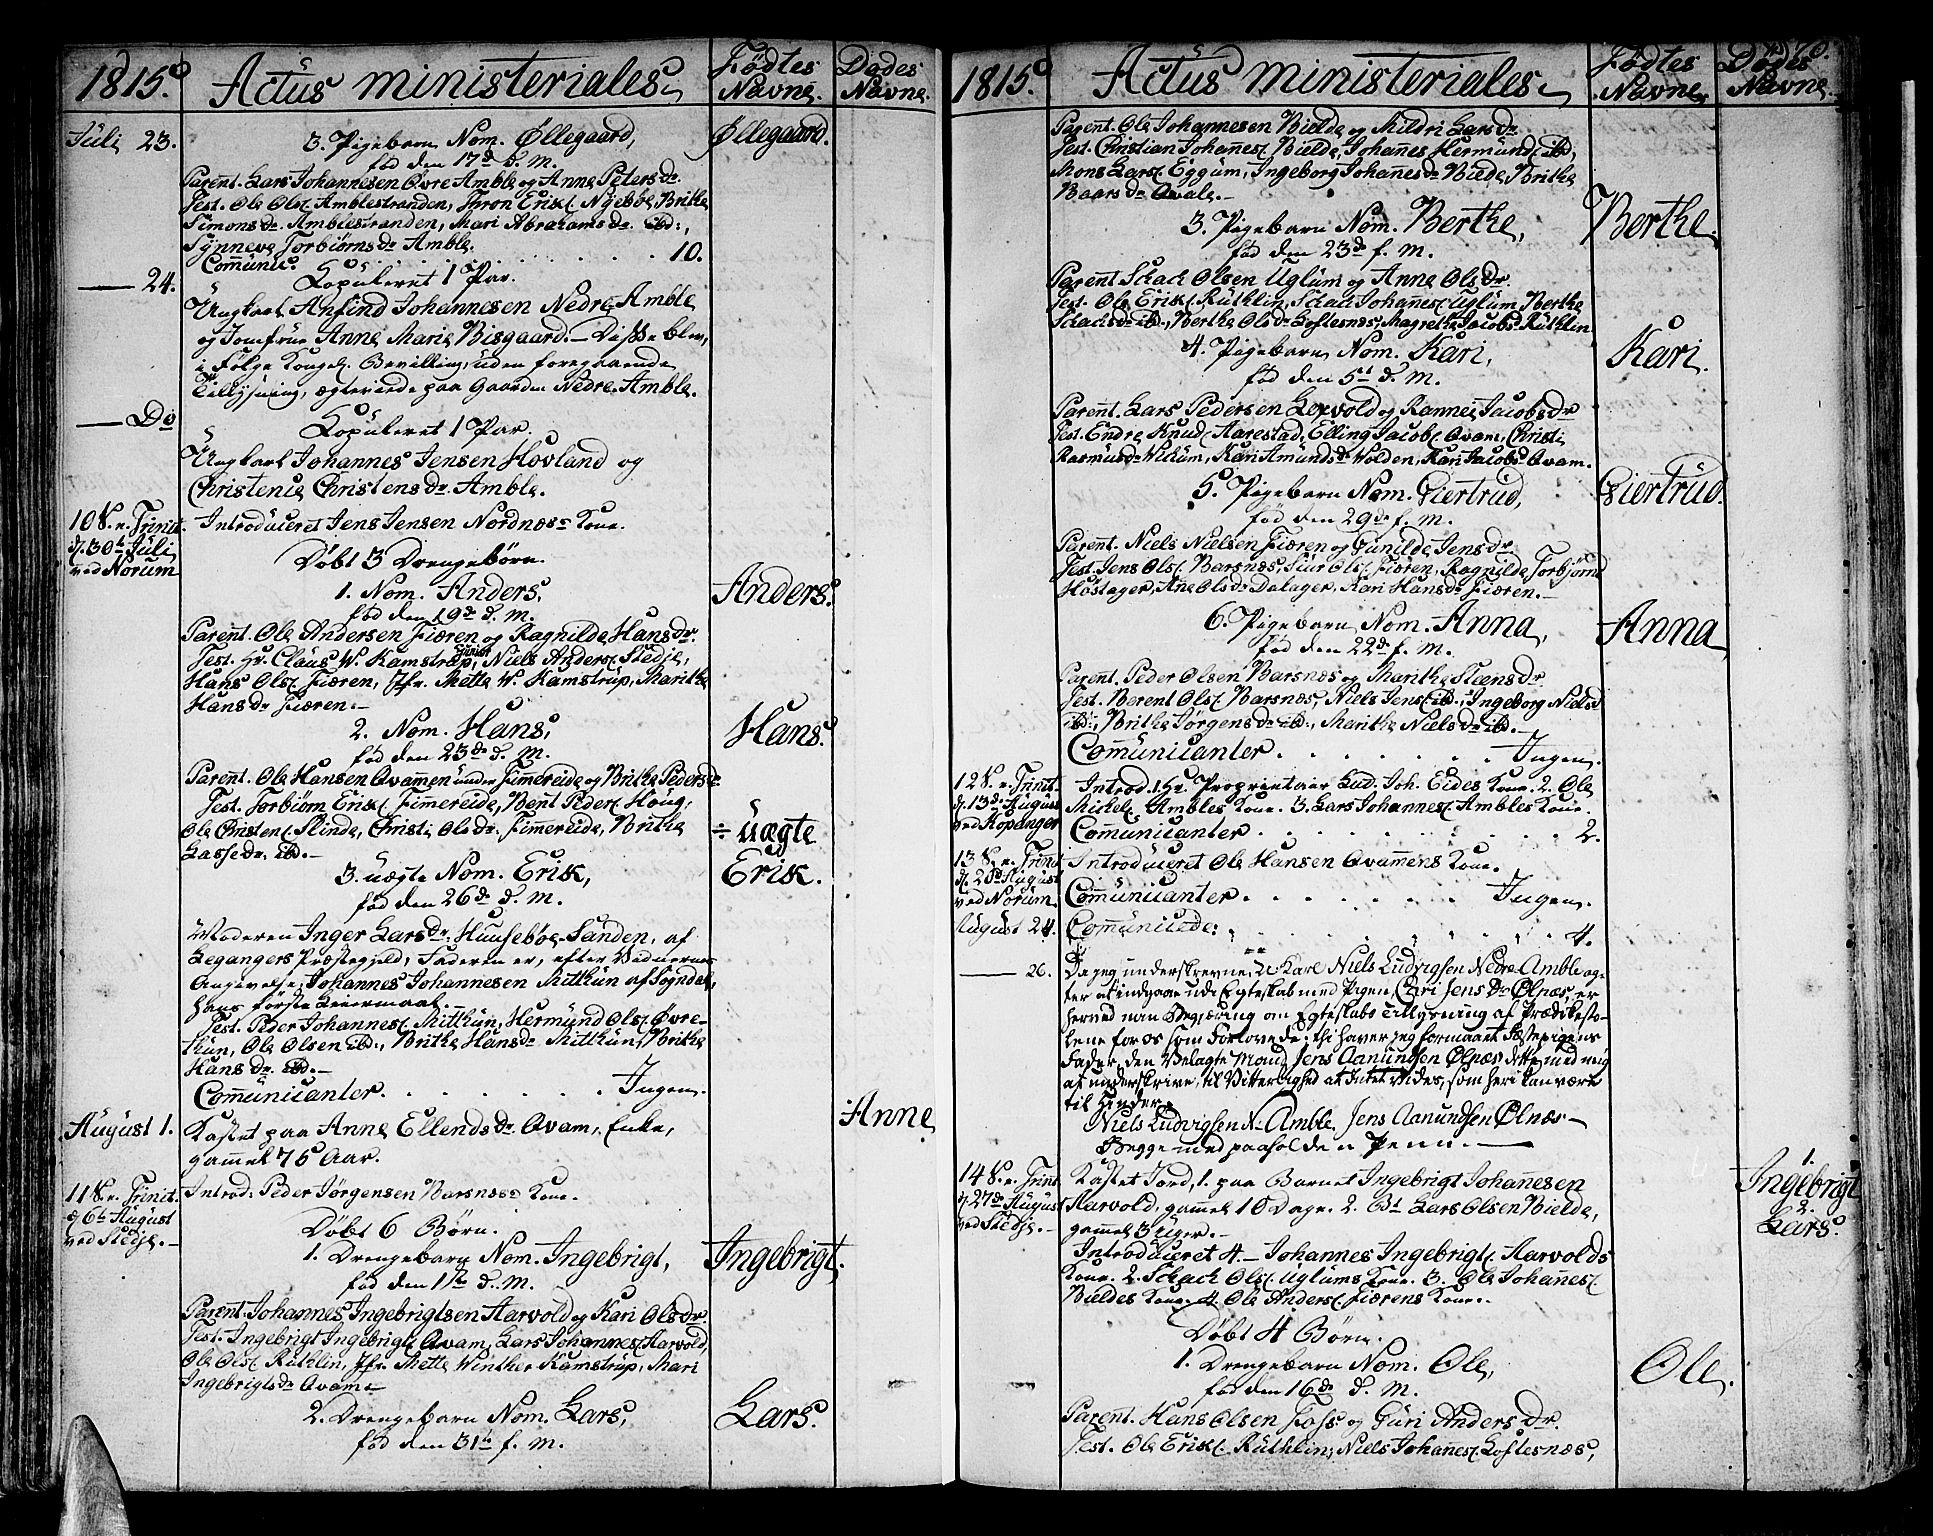 SAB, Sogndal sokneprestembete, H/Haa/Haaa/L0009: Parish register (official) no. A 9, 1809-1821, p. 70